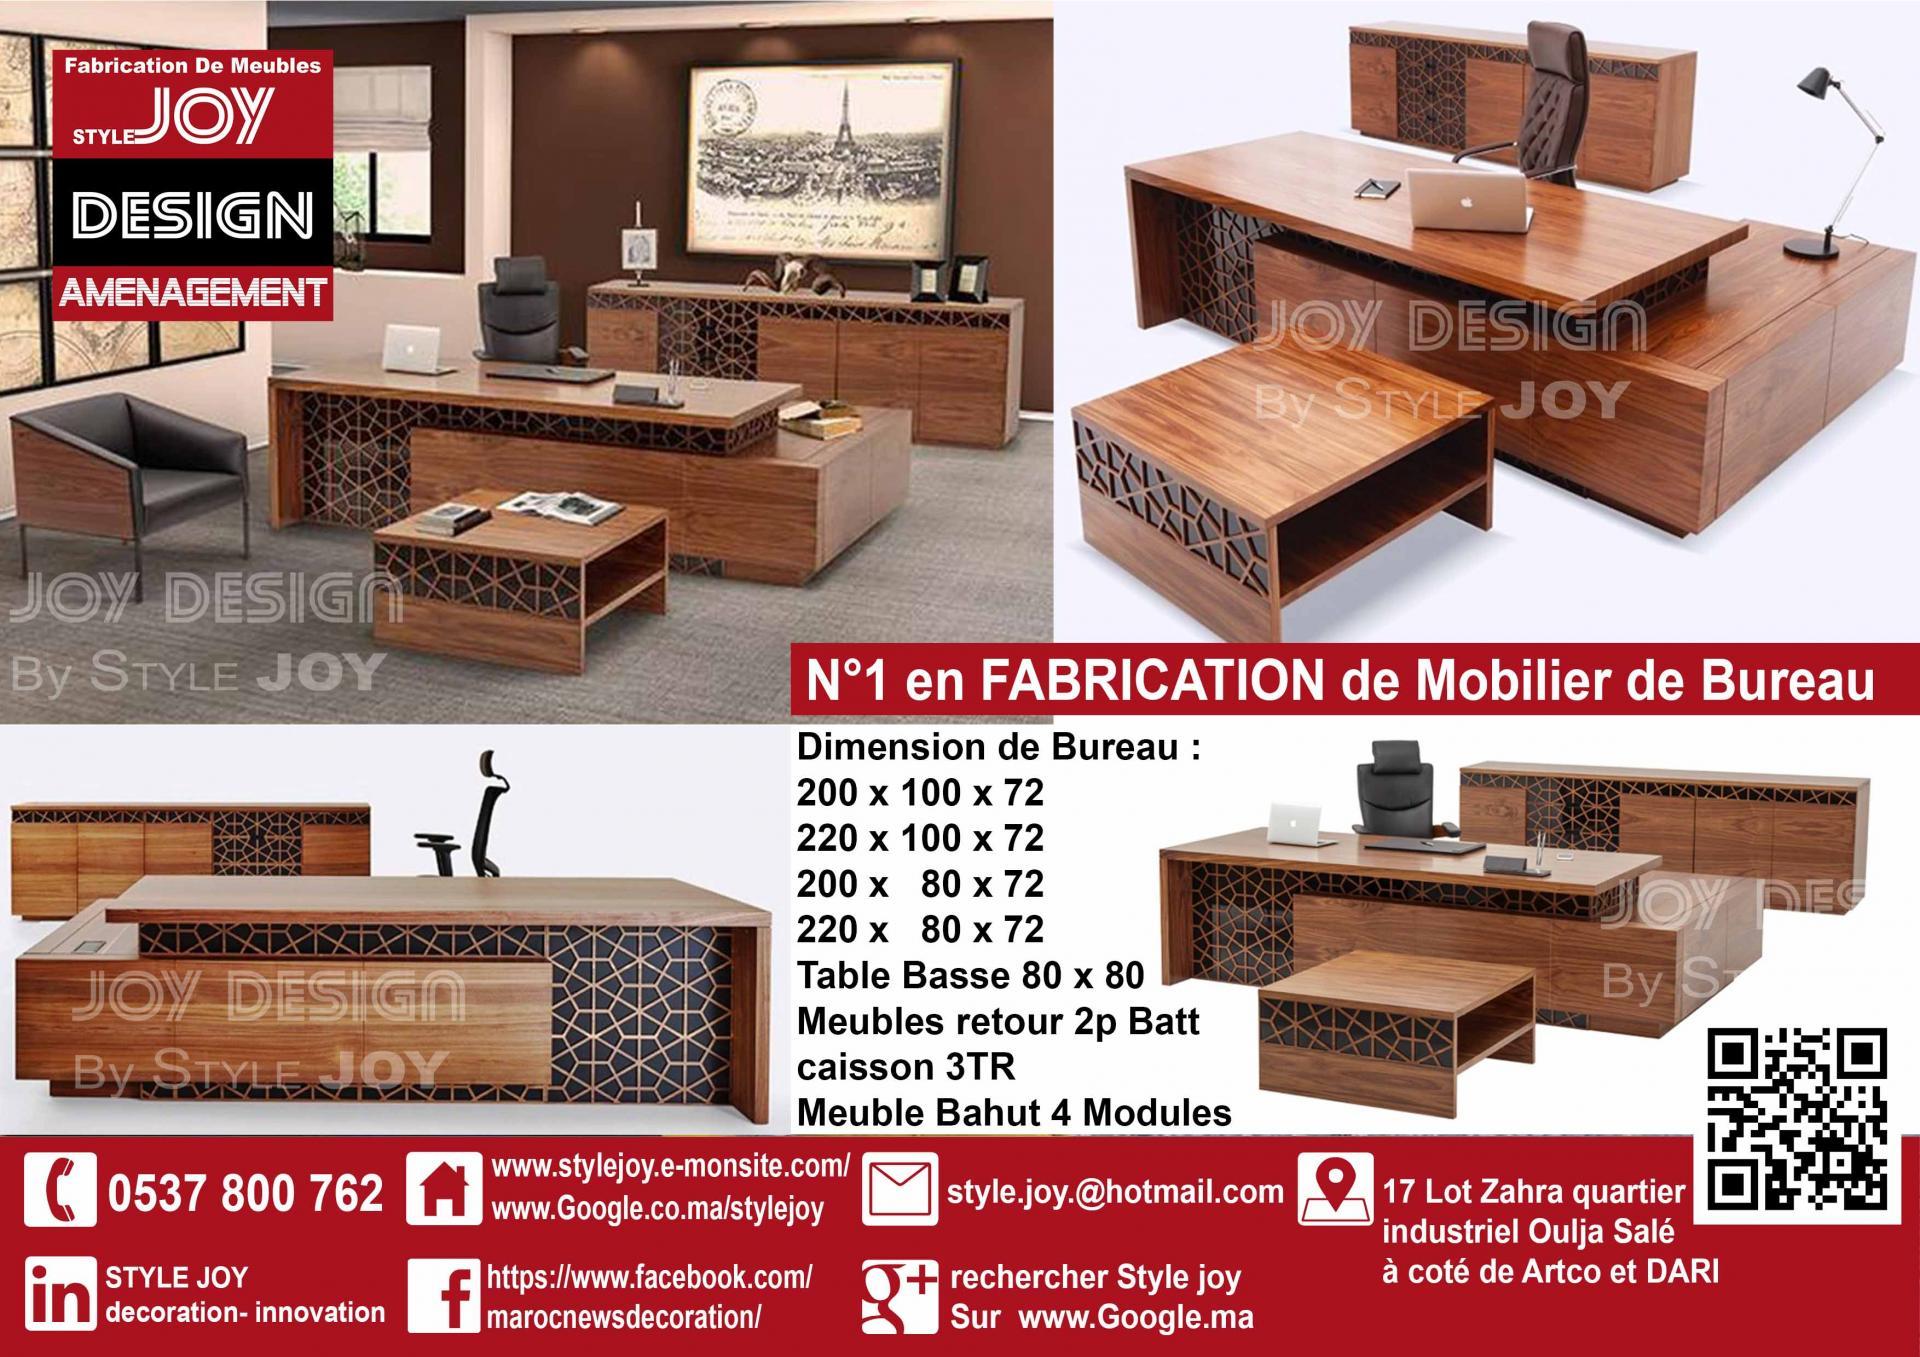 mobilier de bureau rabat maroc bureau mobilier bureau maroc ameublement maroc 01